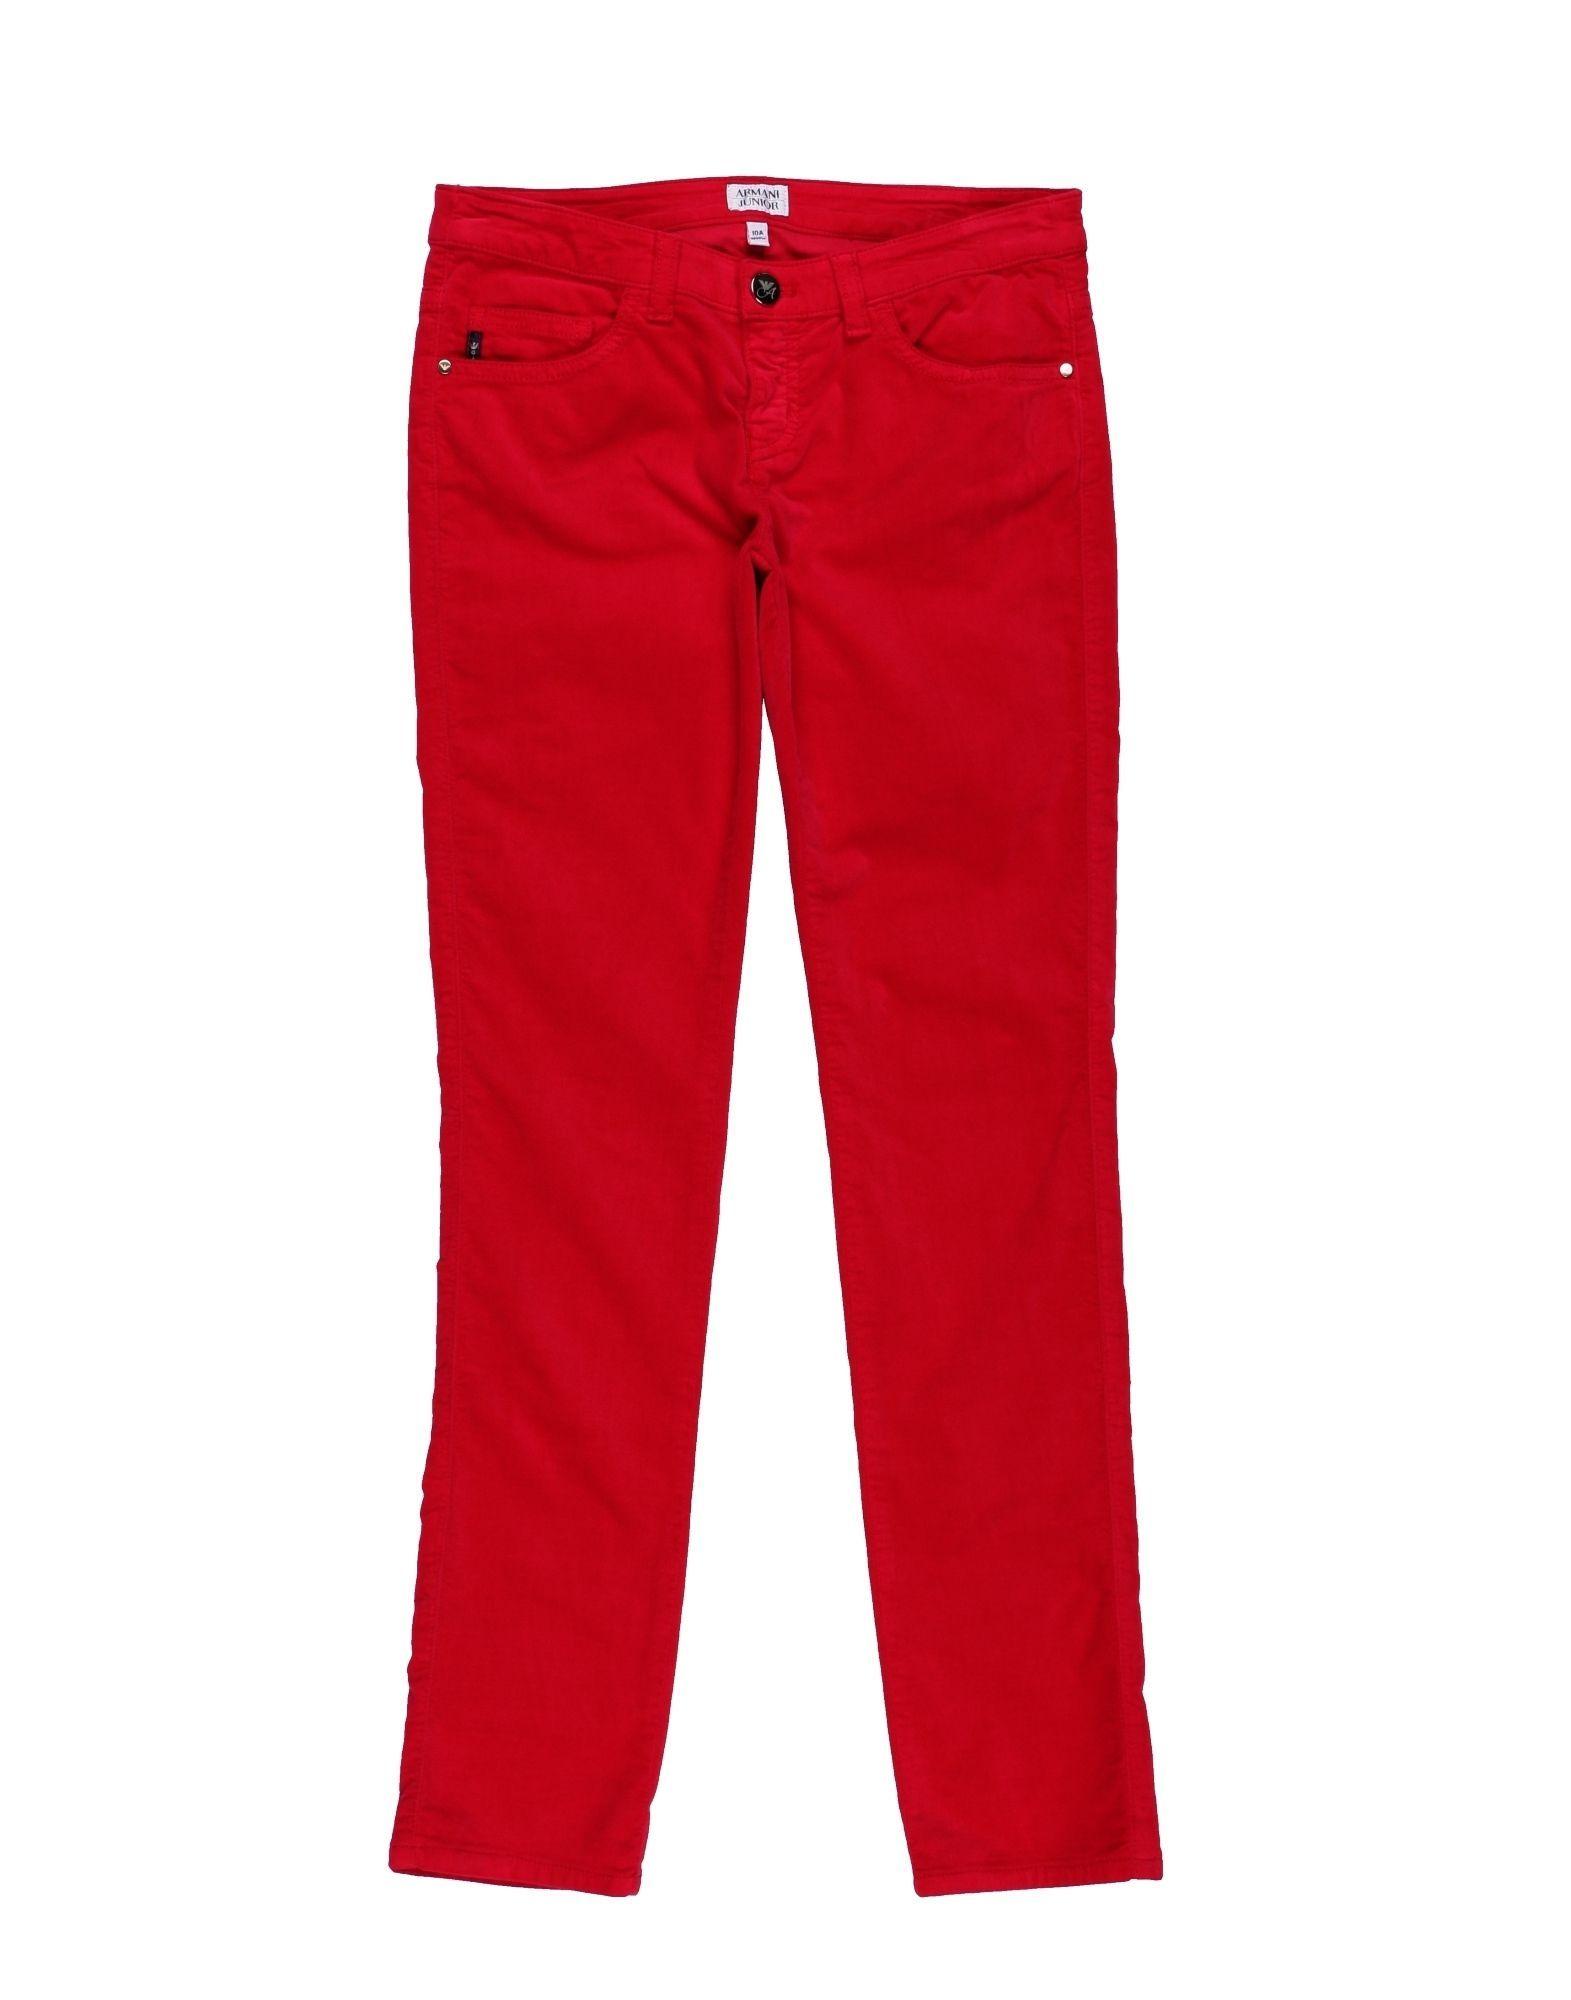 TROUSERS Armani Junior Red Girl Cotton